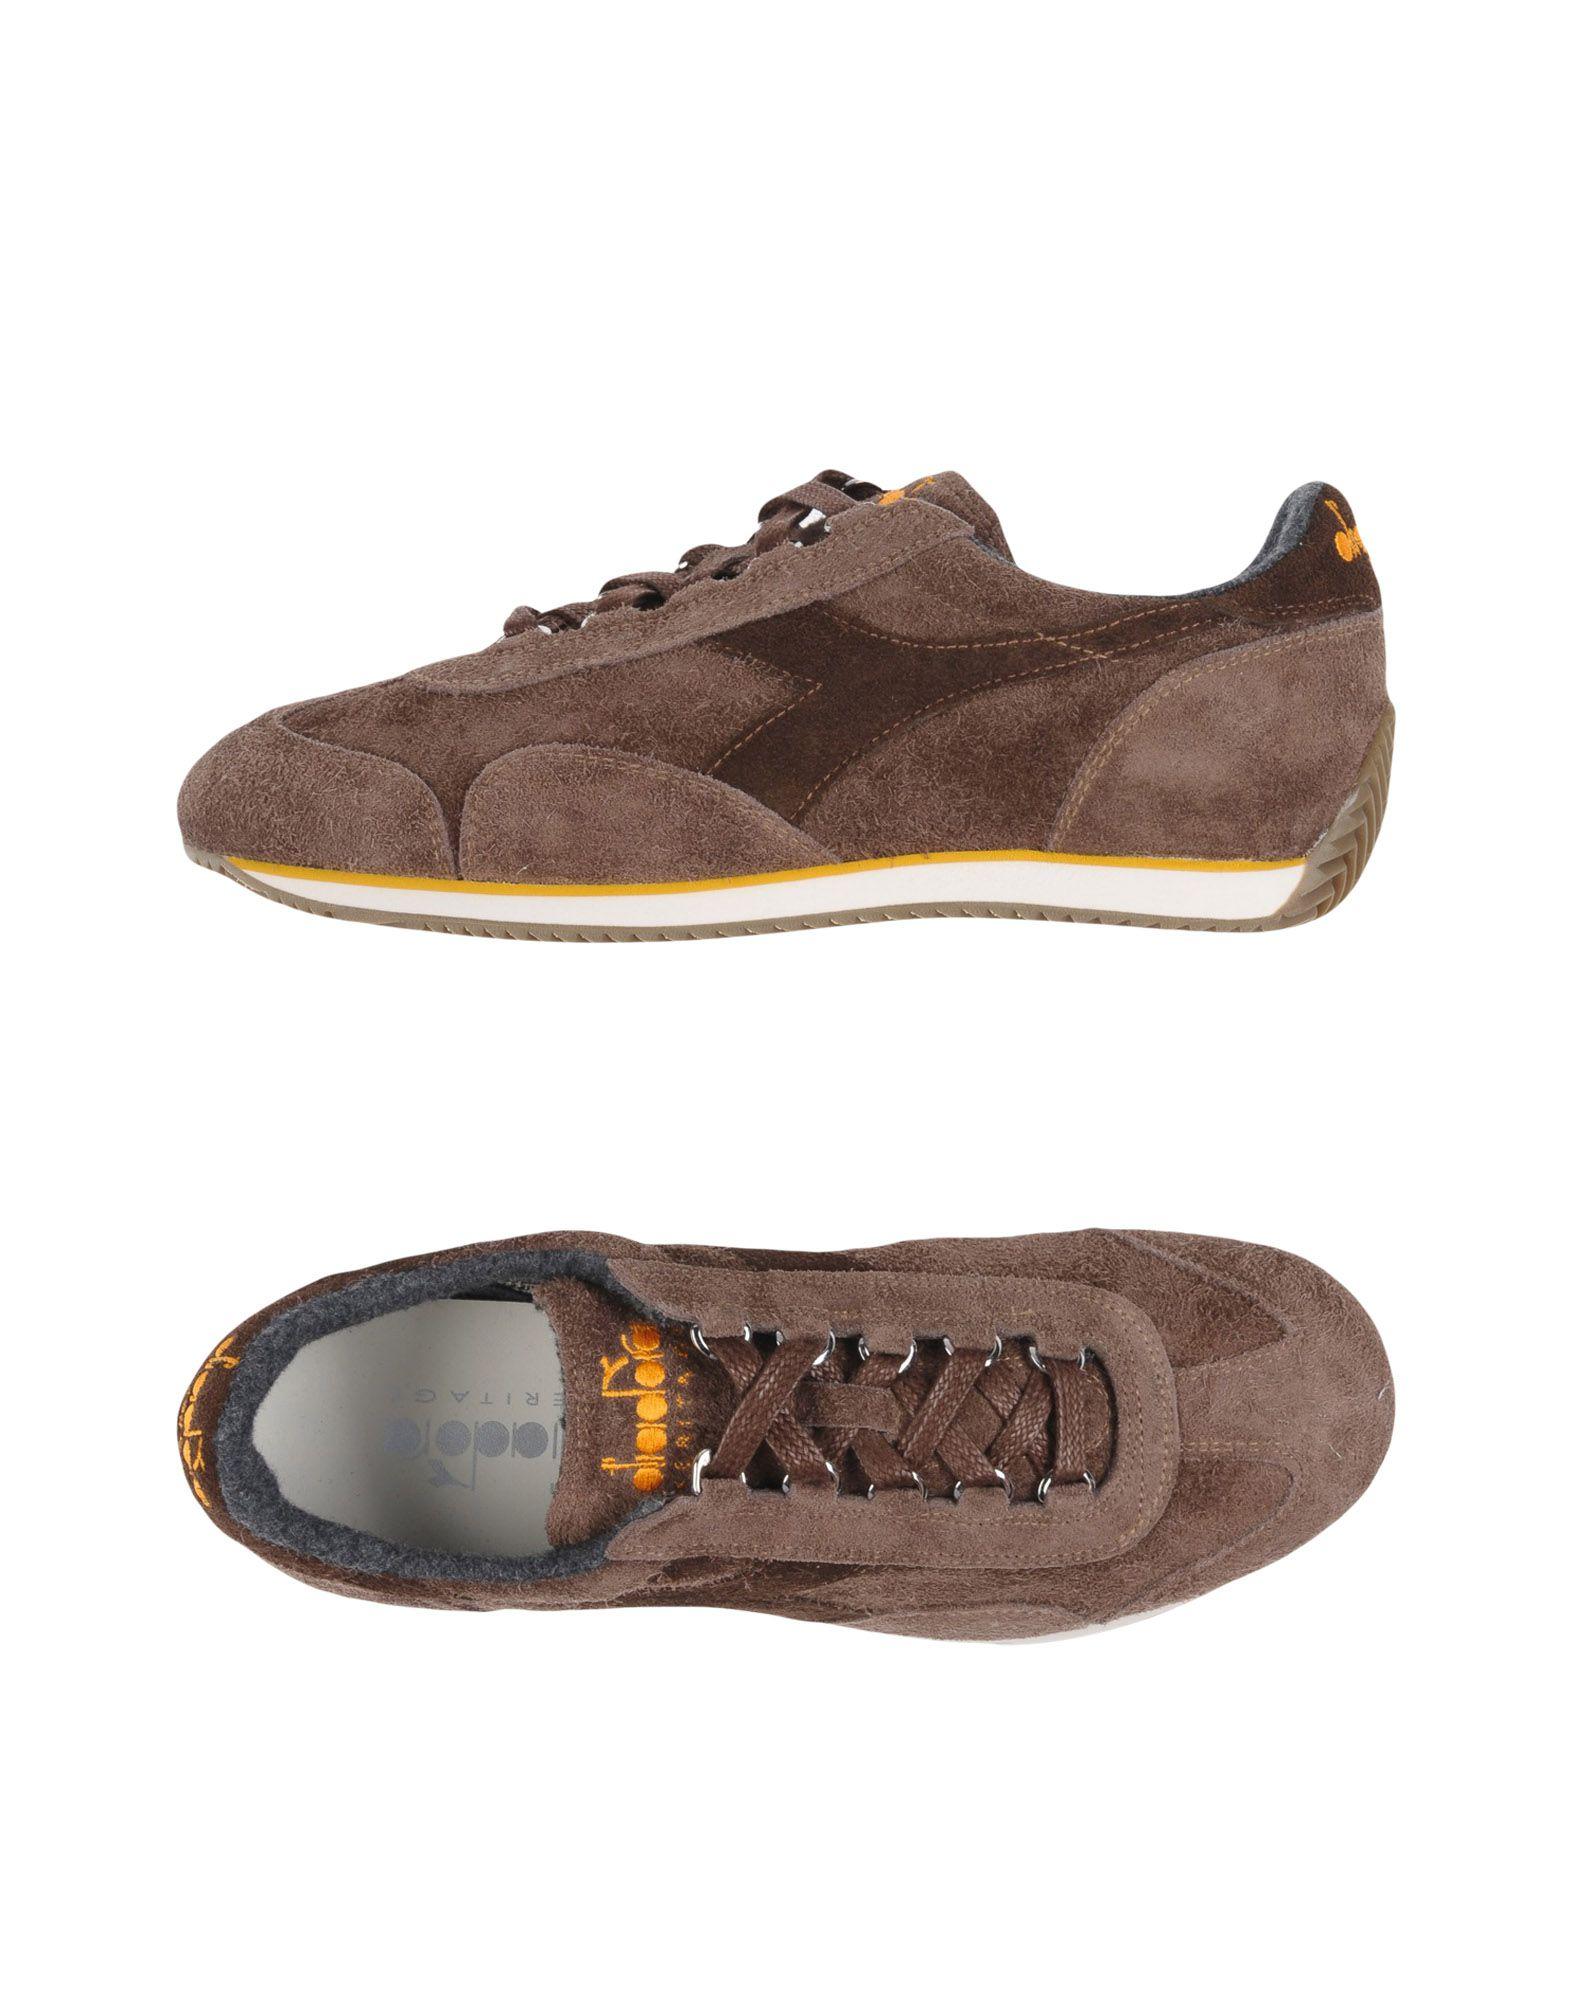 Diadora Heritage Heritage Sneakers - Men Diadora Heritage Heritage Sneakers online on  Canada - 11228769NX 639423